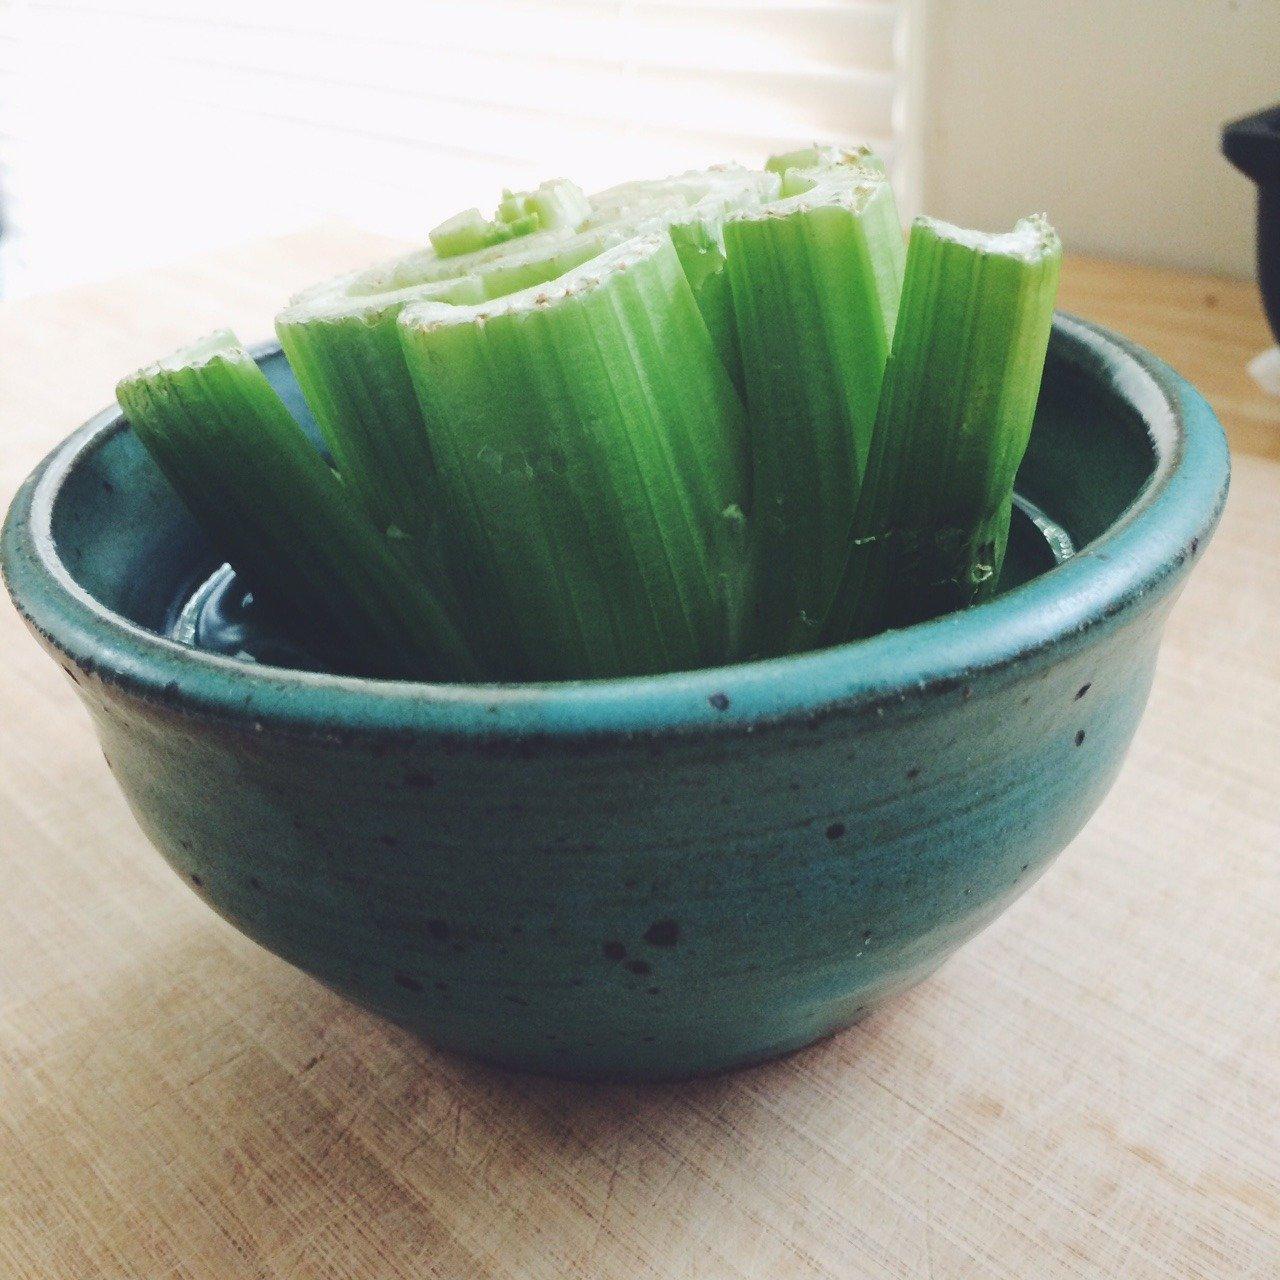 37 Kitchen Scraps You Can Regrow: Regrow Plants From Kitchen Scraps